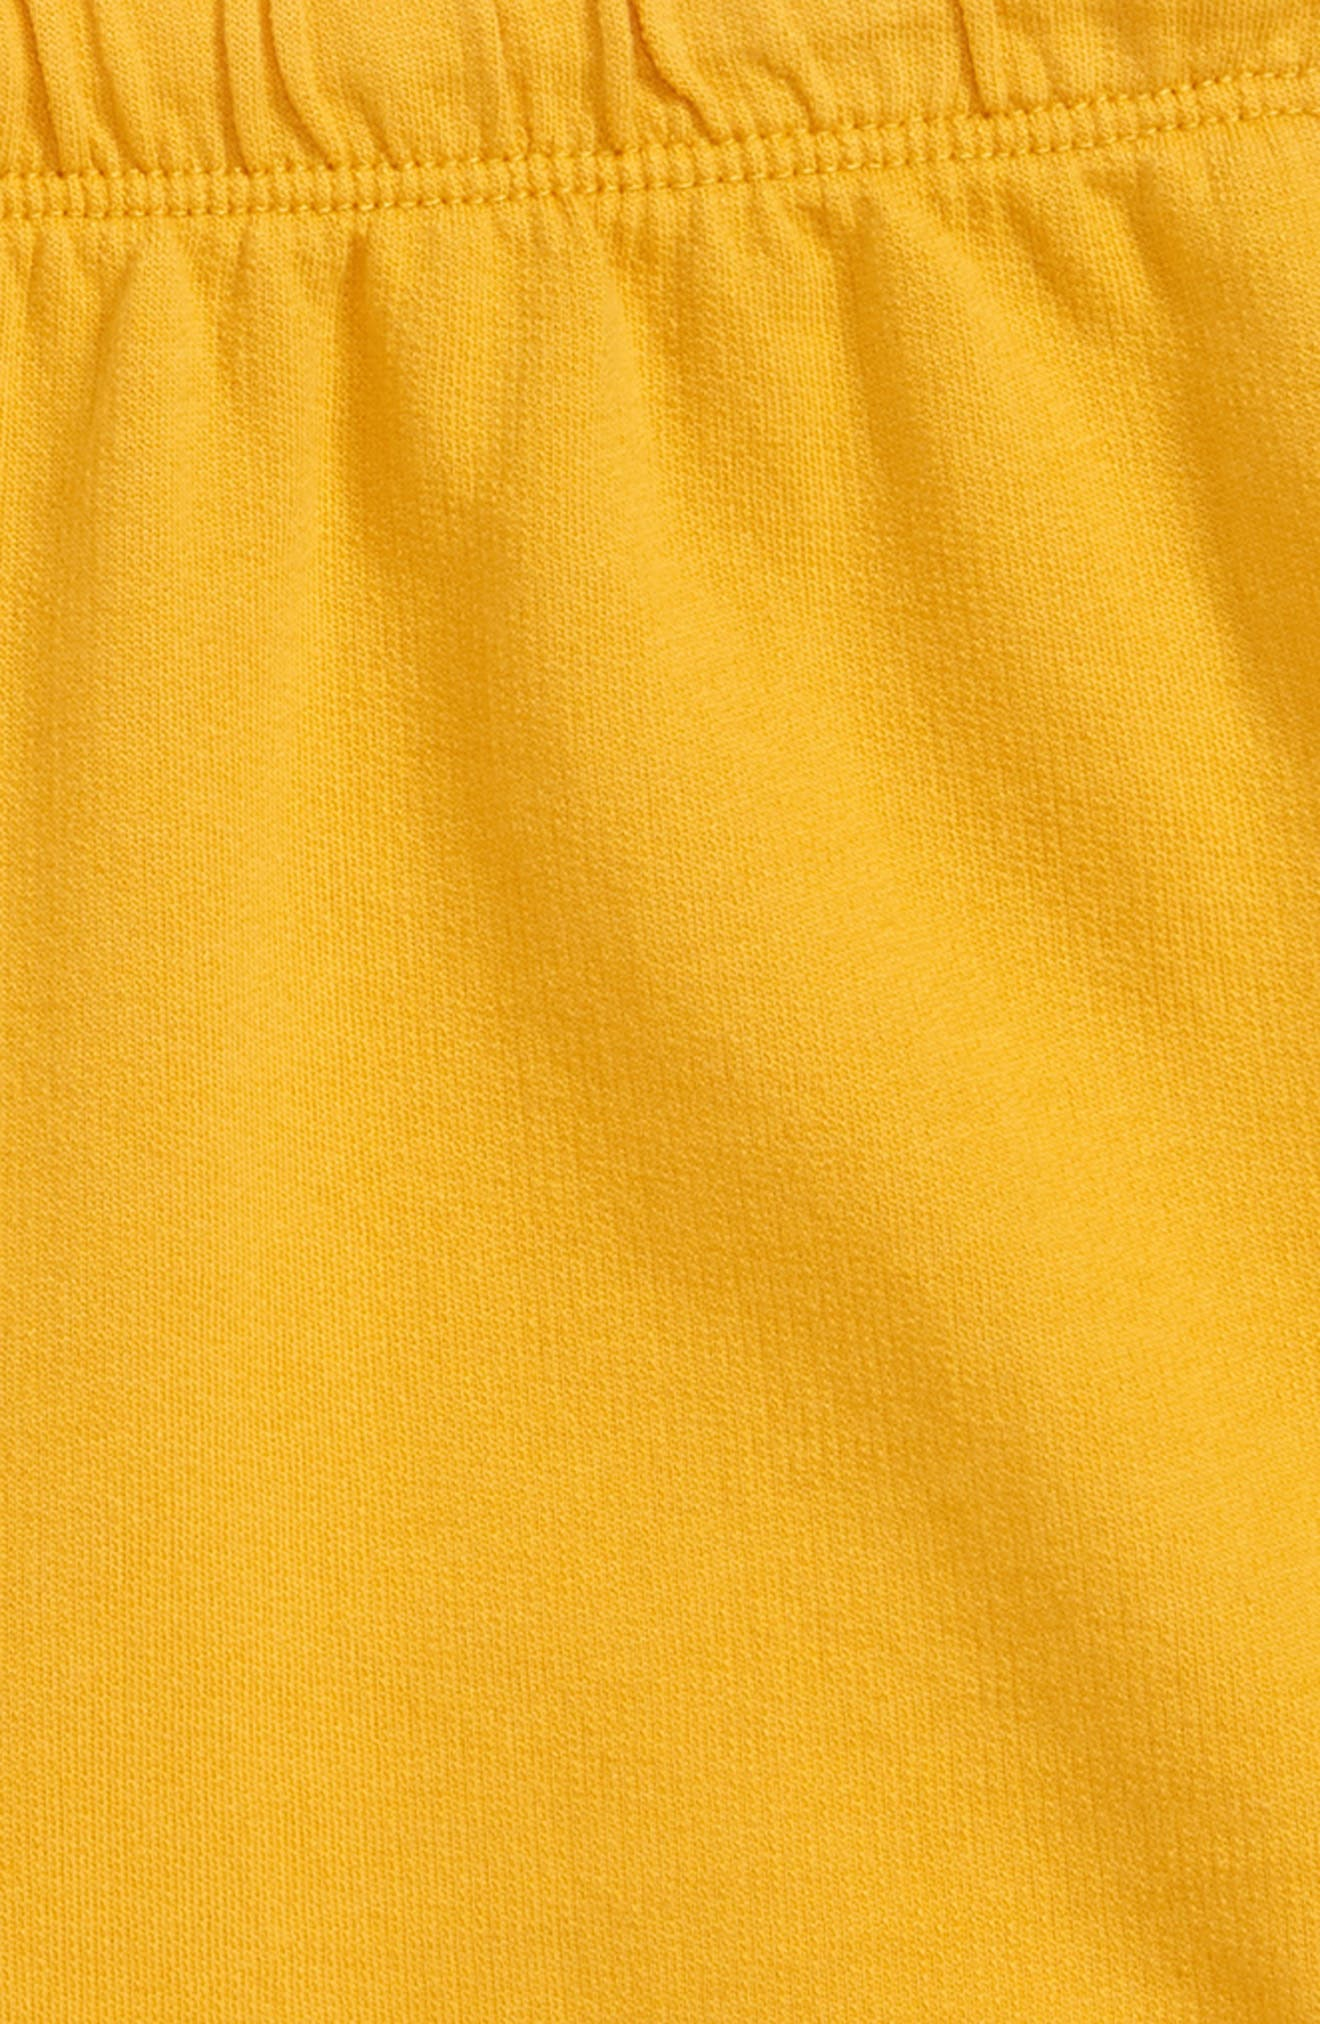 Cotton Dolphin Shorts,                             Alternate thumbnail 11, color,